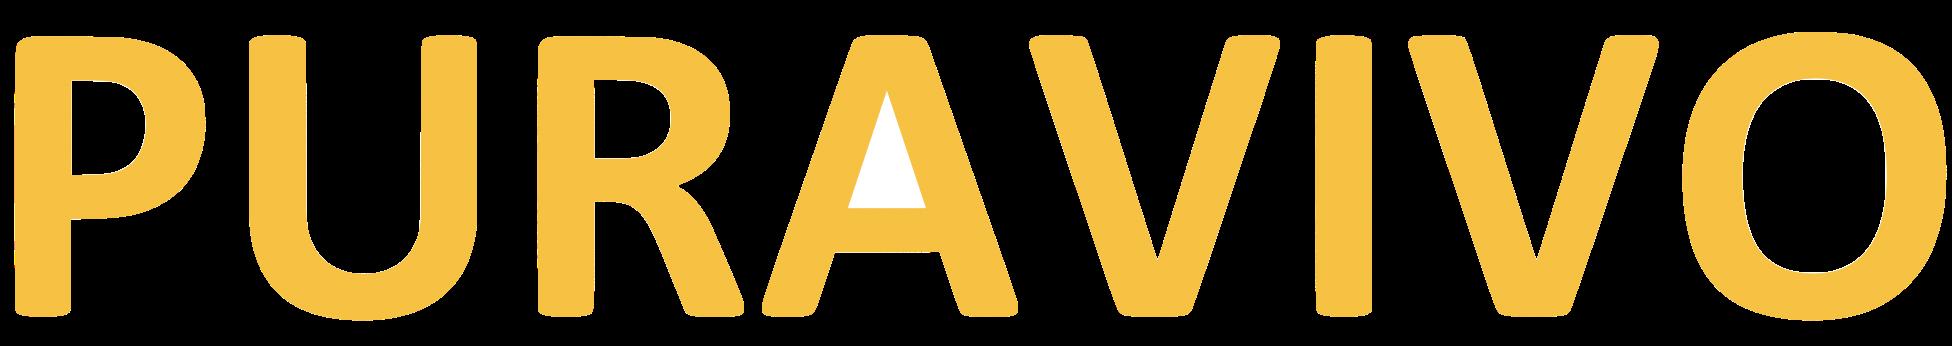 PURAVIVO